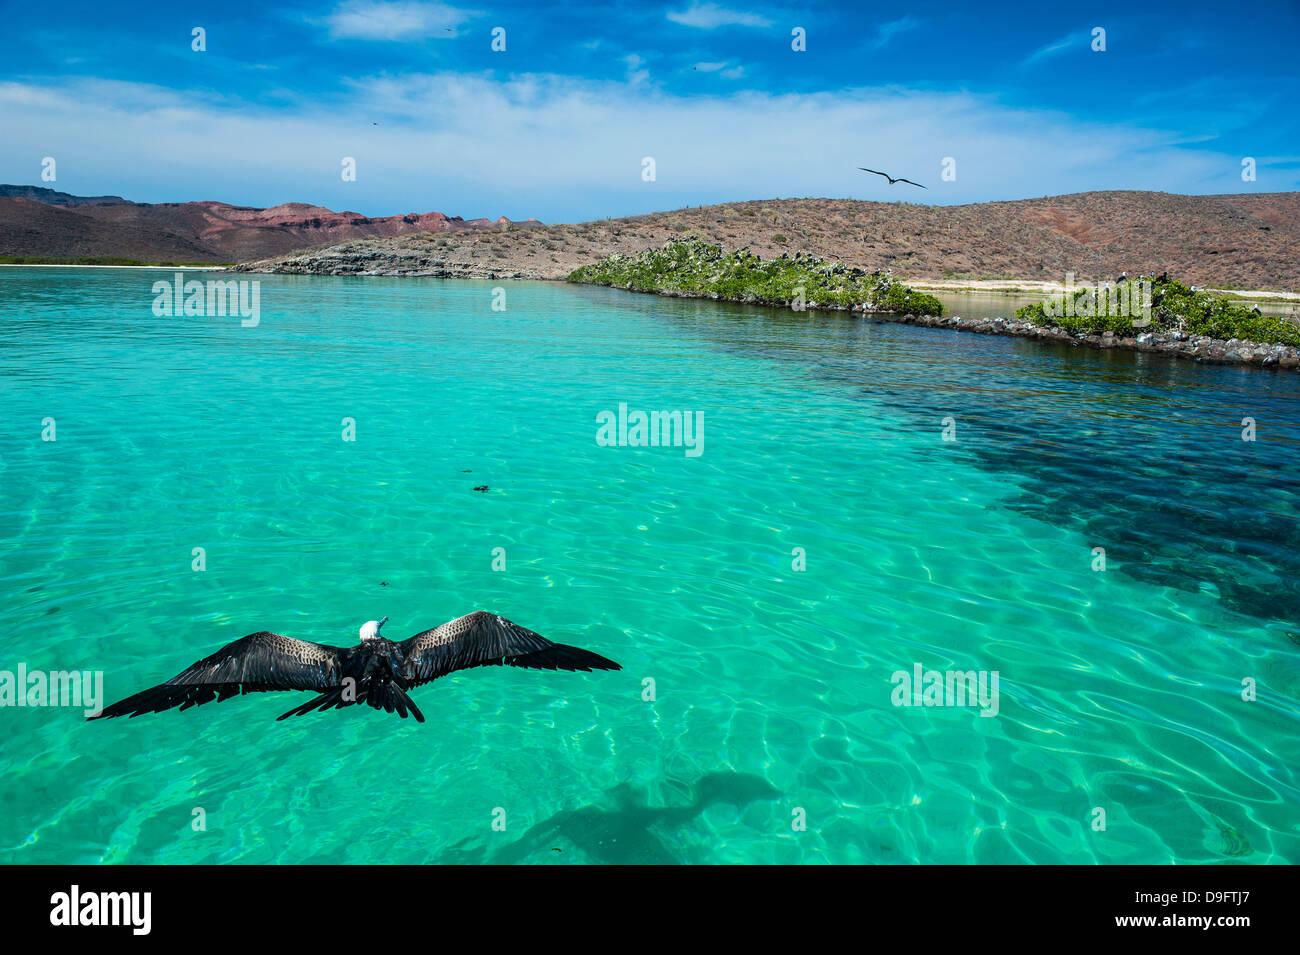 Fregattvogel und das türkisfarbene Wasser der Isla Espíritu Santo, Baja California, Mexiko Stockbild